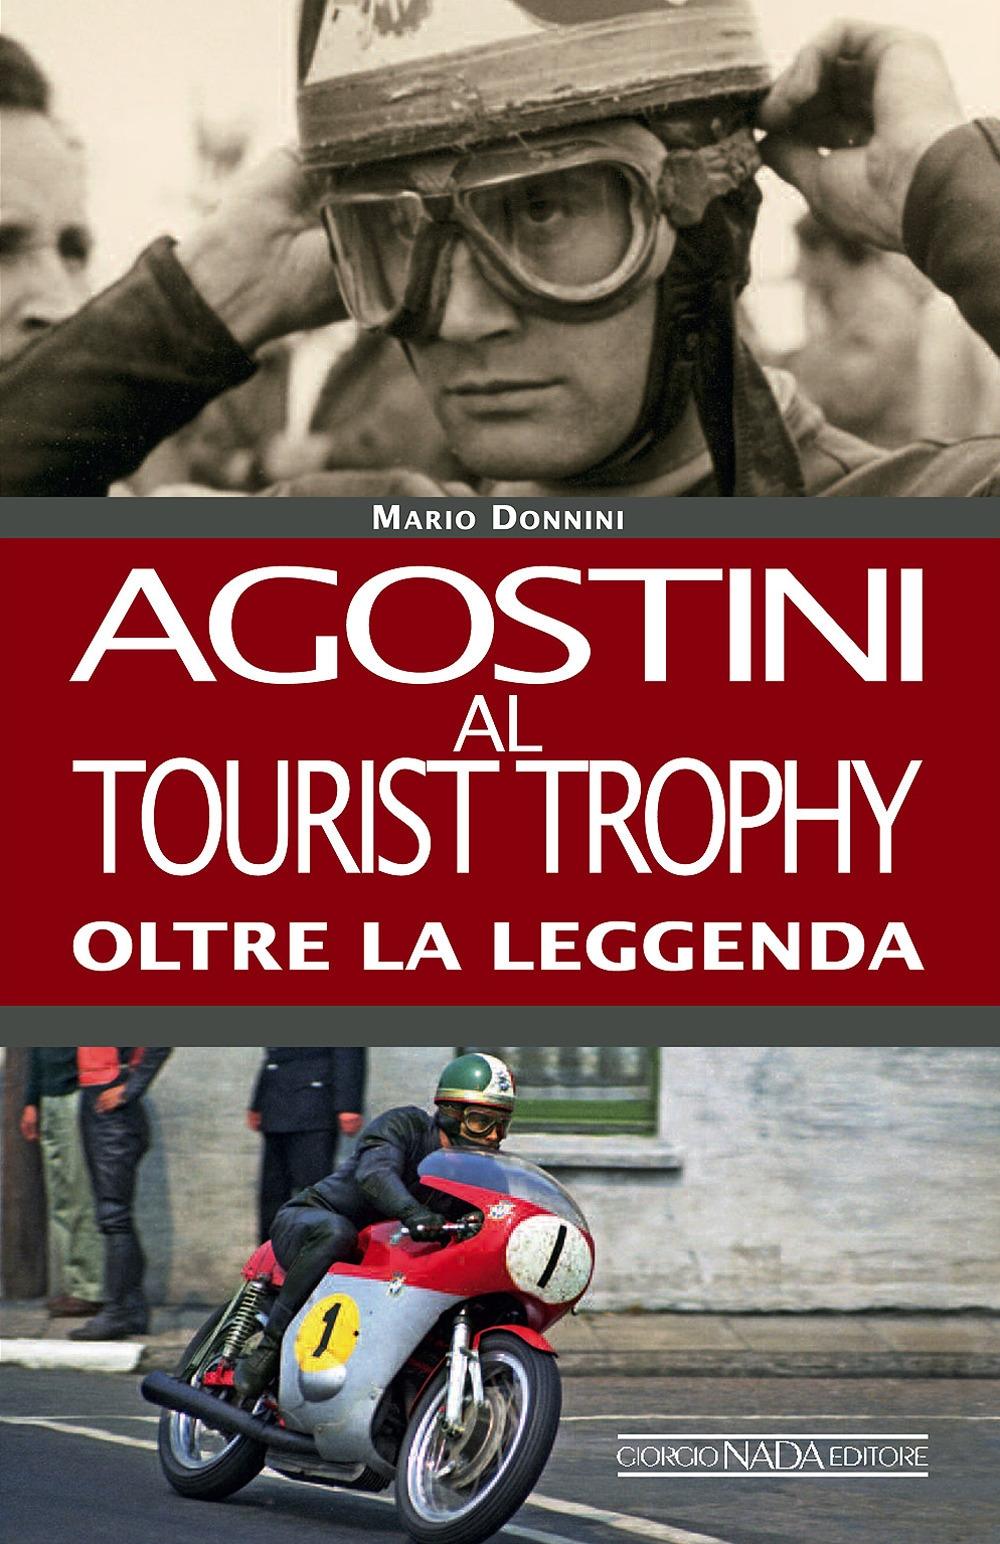 Agostini al Tourist Trophy. Oltre la leggenda. Ediz. illustrata